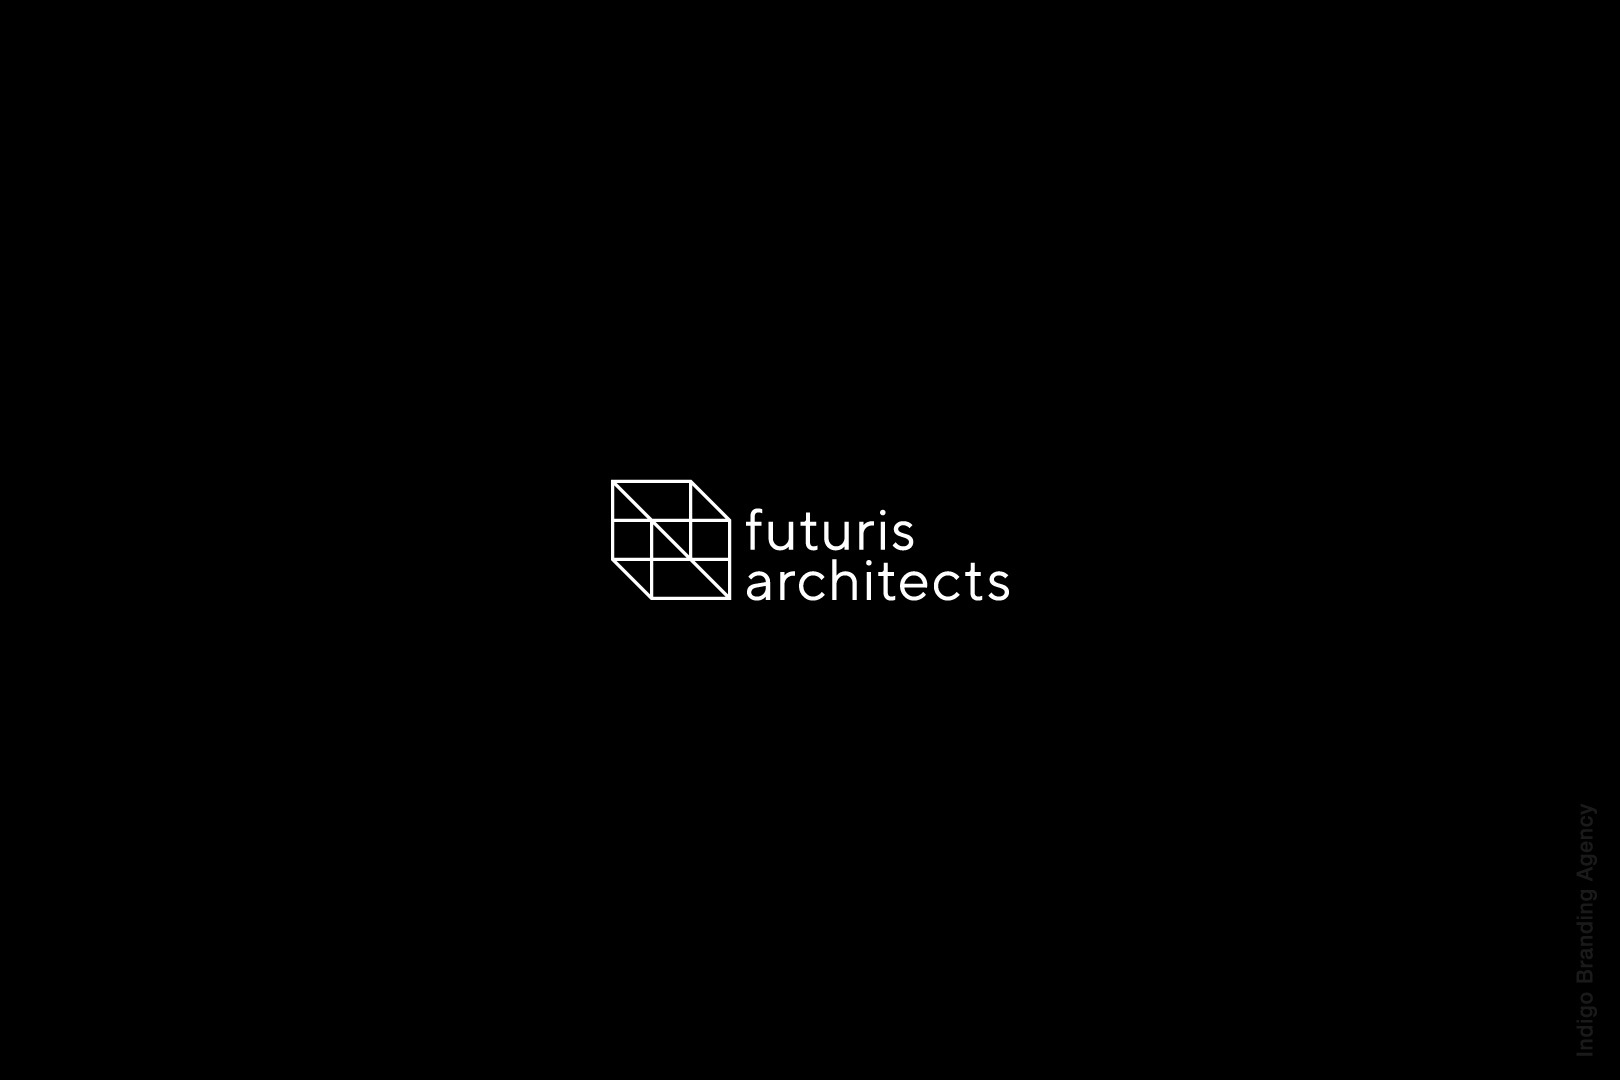 architectural branding futuris architects logo interior design